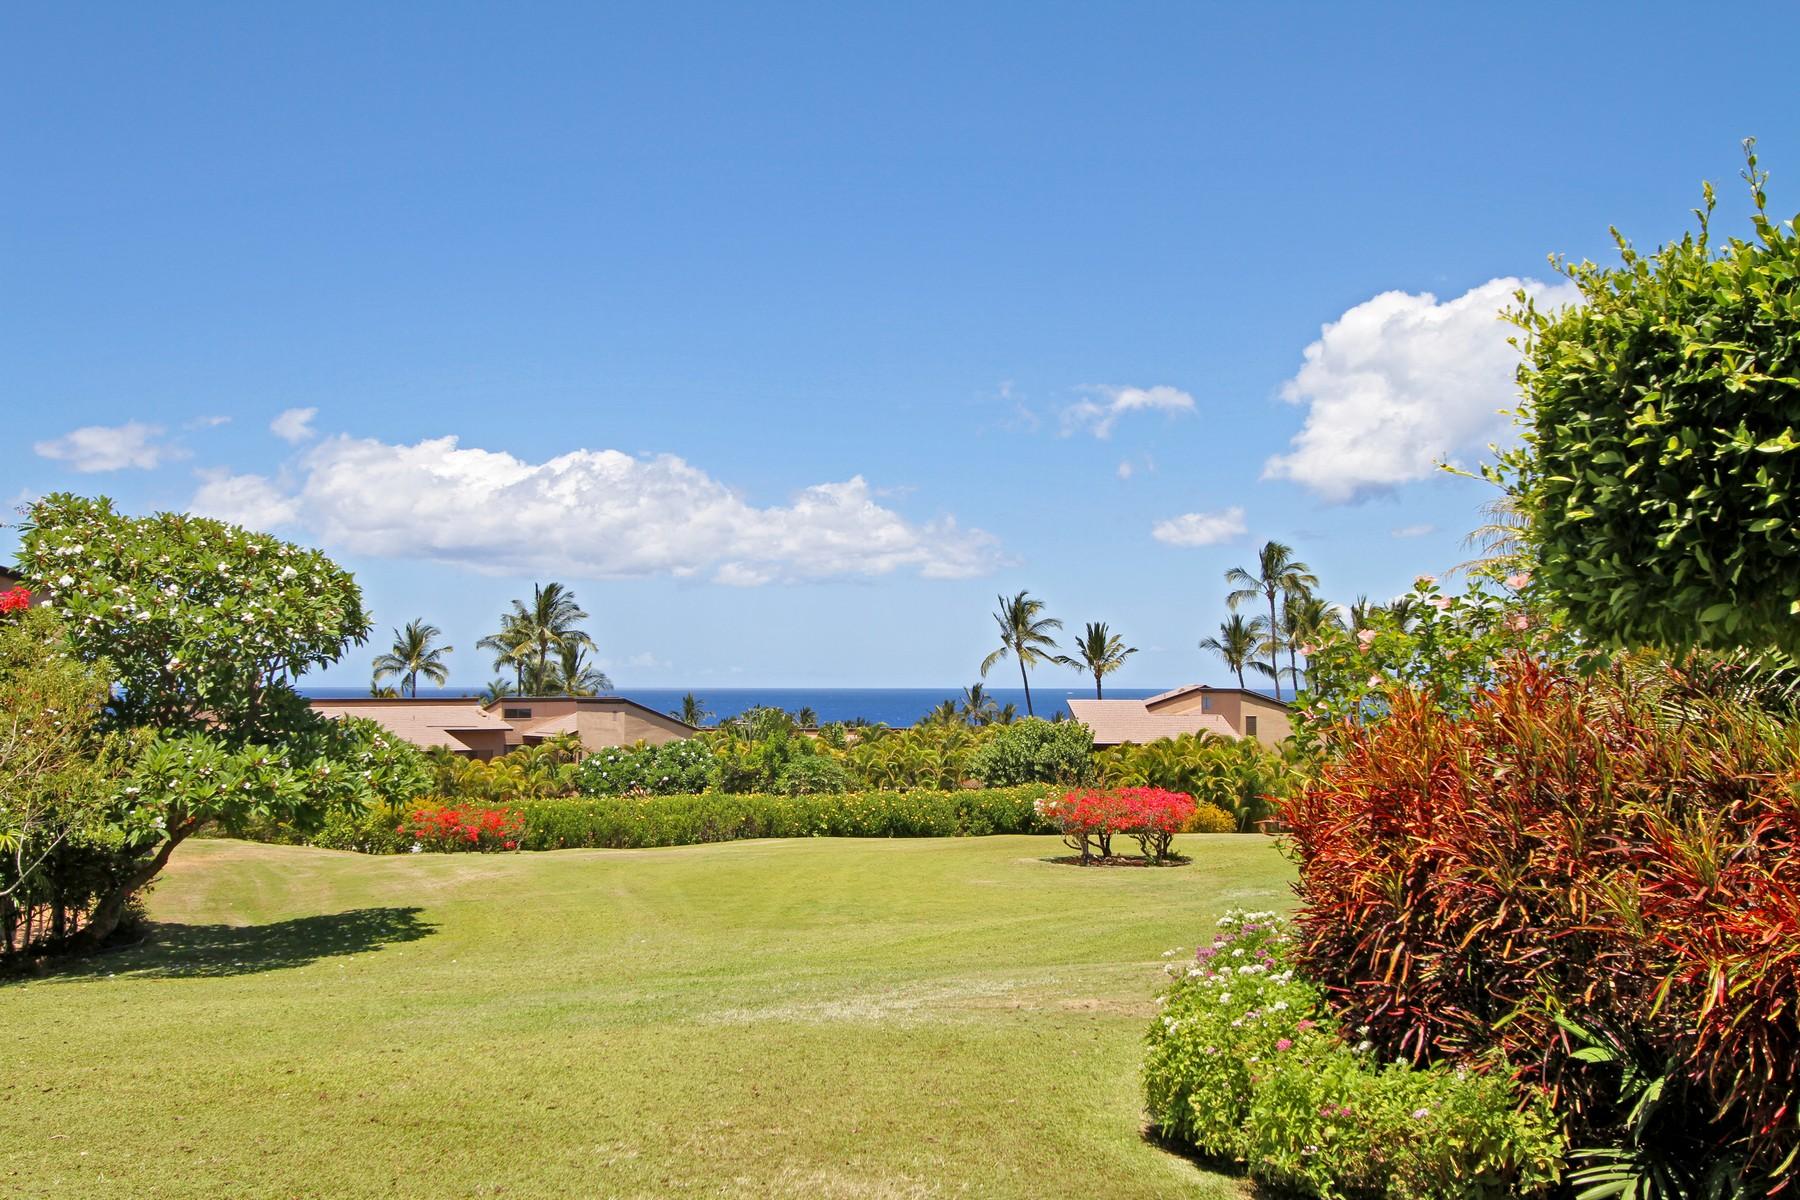 Condomínio para Venda às Successful Vacation Rental in Maui 3300 Wailea Alanui Drive, Wailea Ekahi 39C Wailea, Havaí, 96753 Estados Unidos